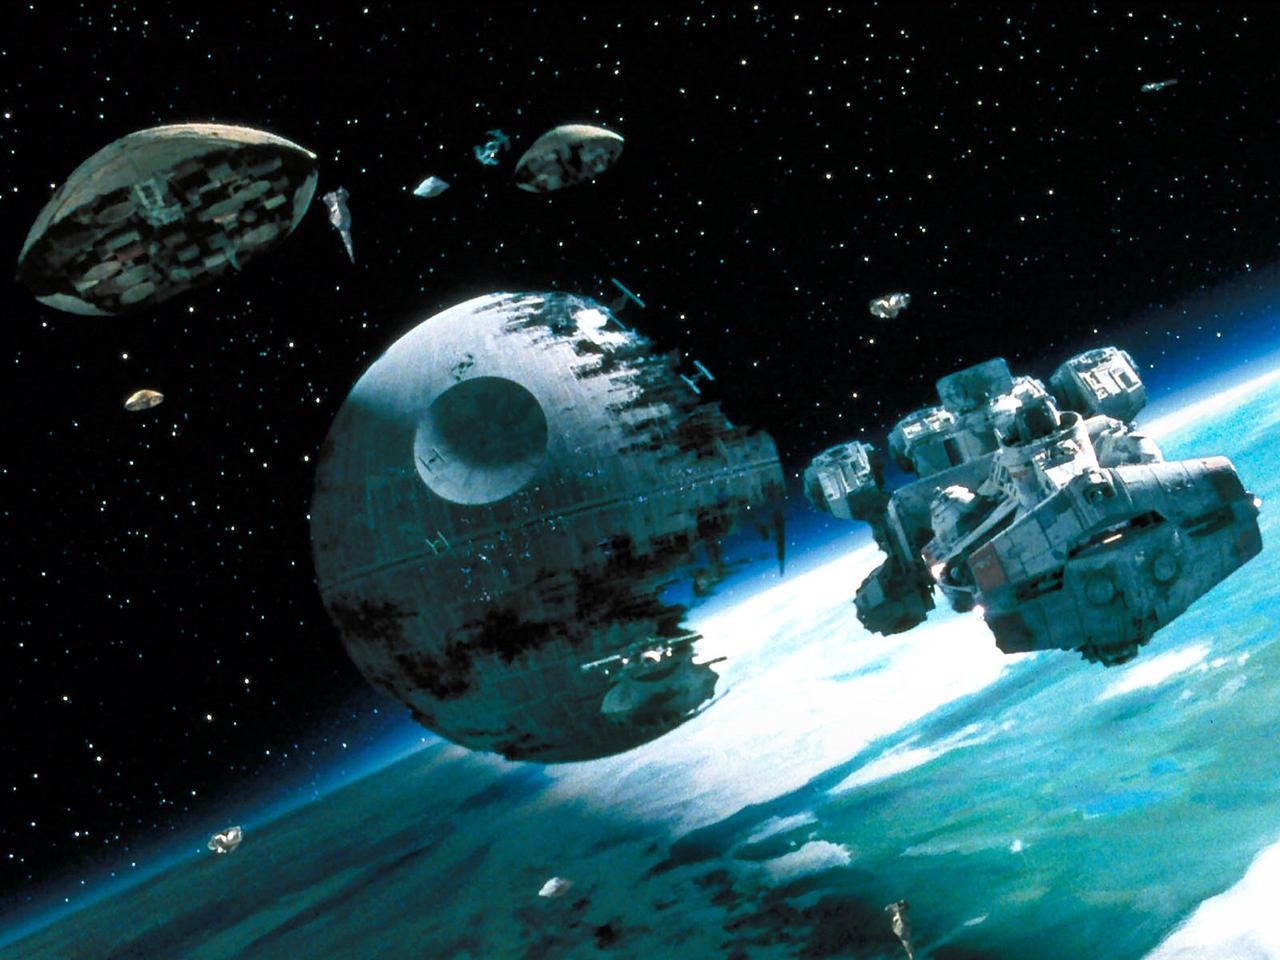 star wars battle of endor wallpaper by squallline77 ddzz8iq